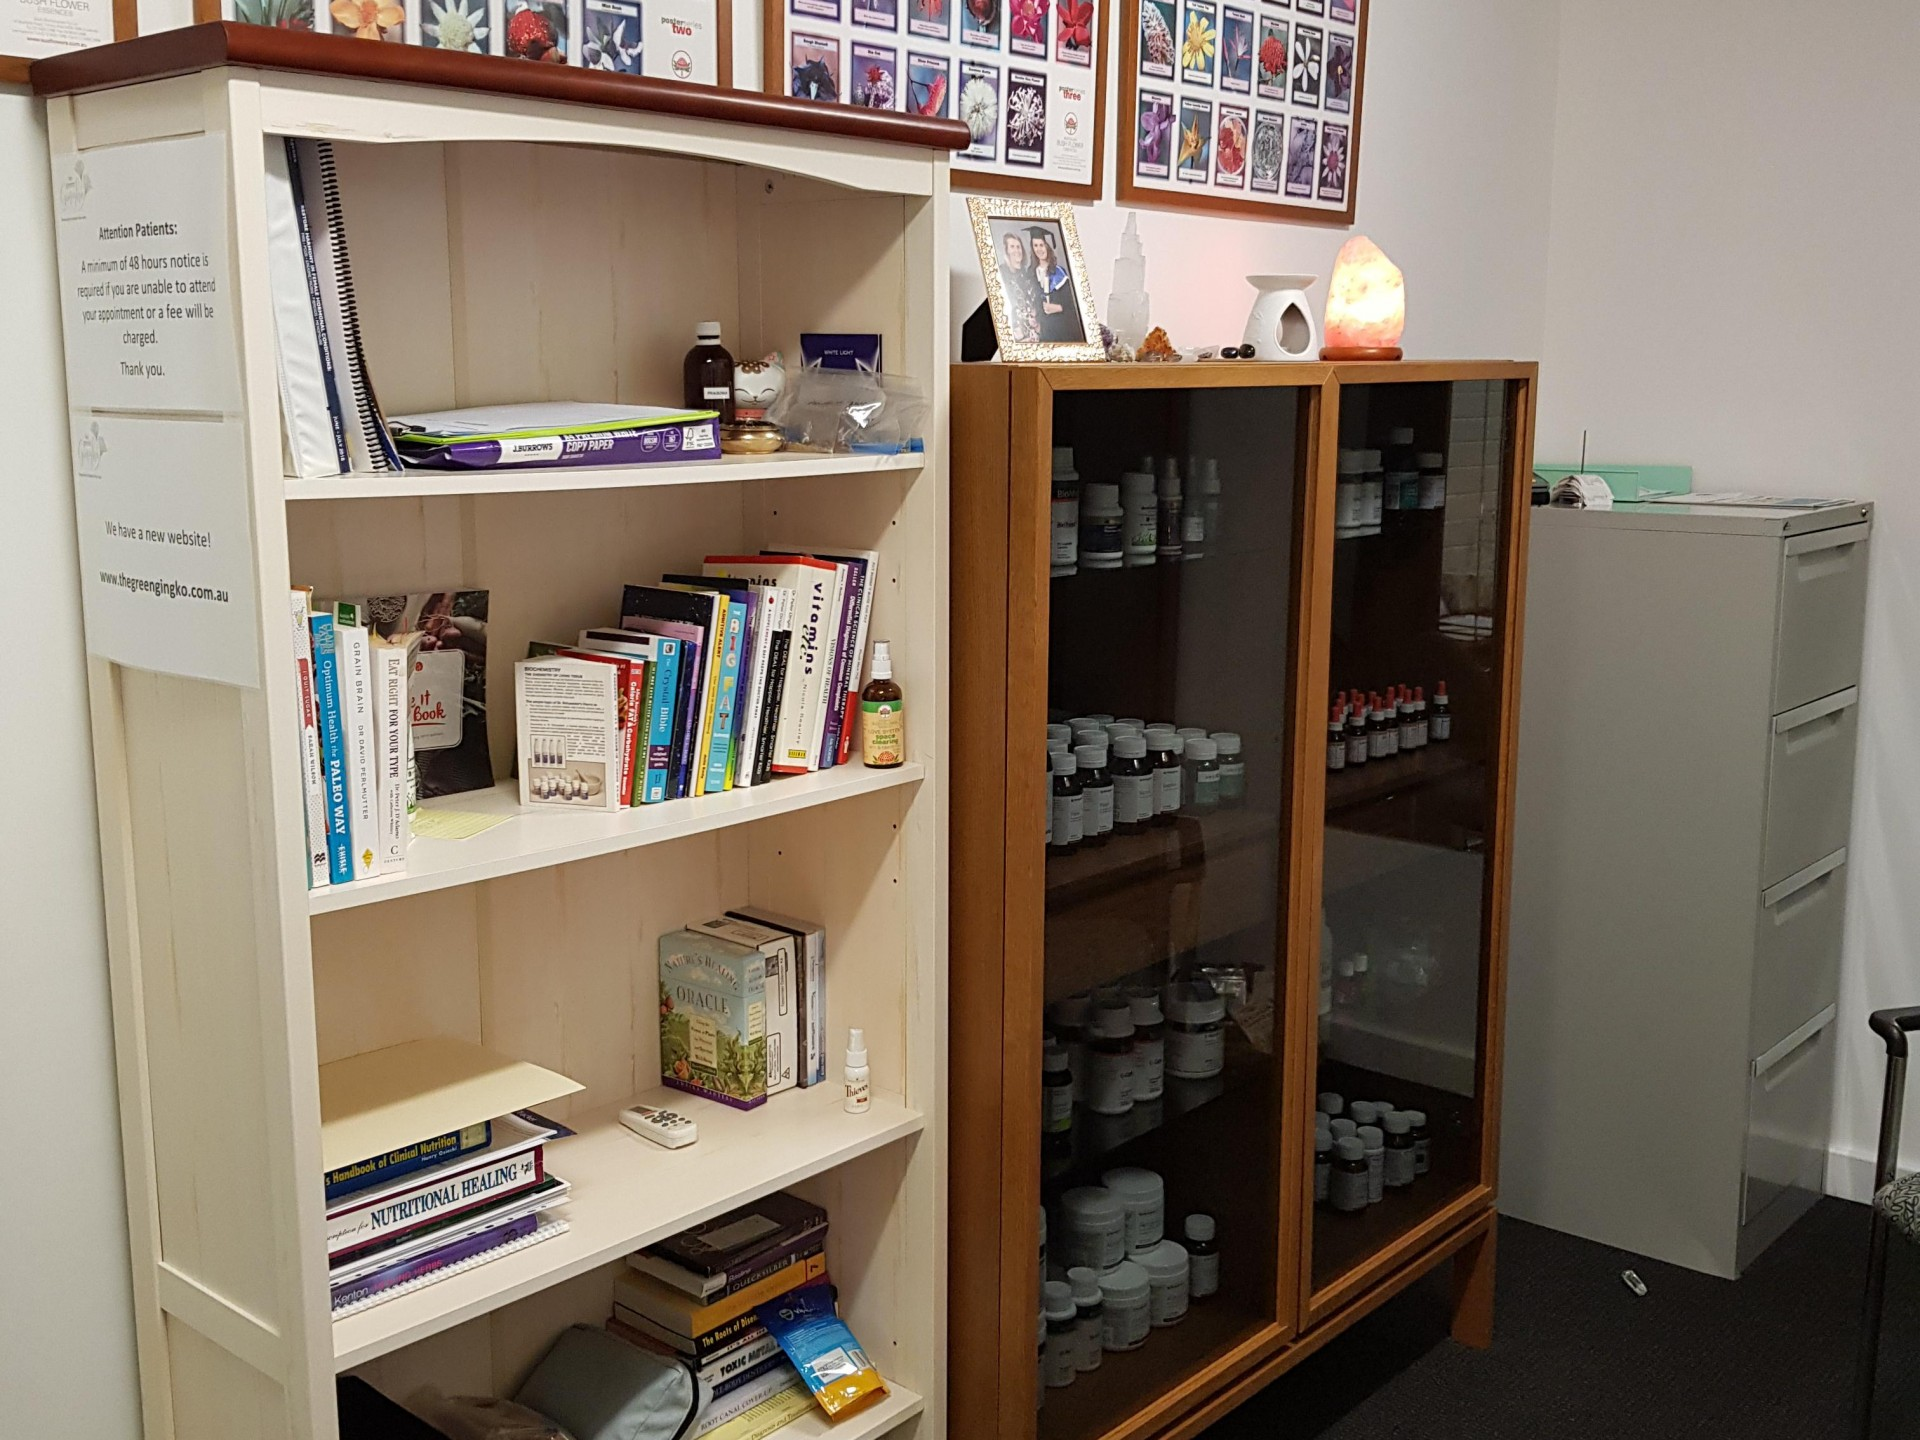 naturopathic-clinic-for-sale-98-000-plus-sav-abb-2